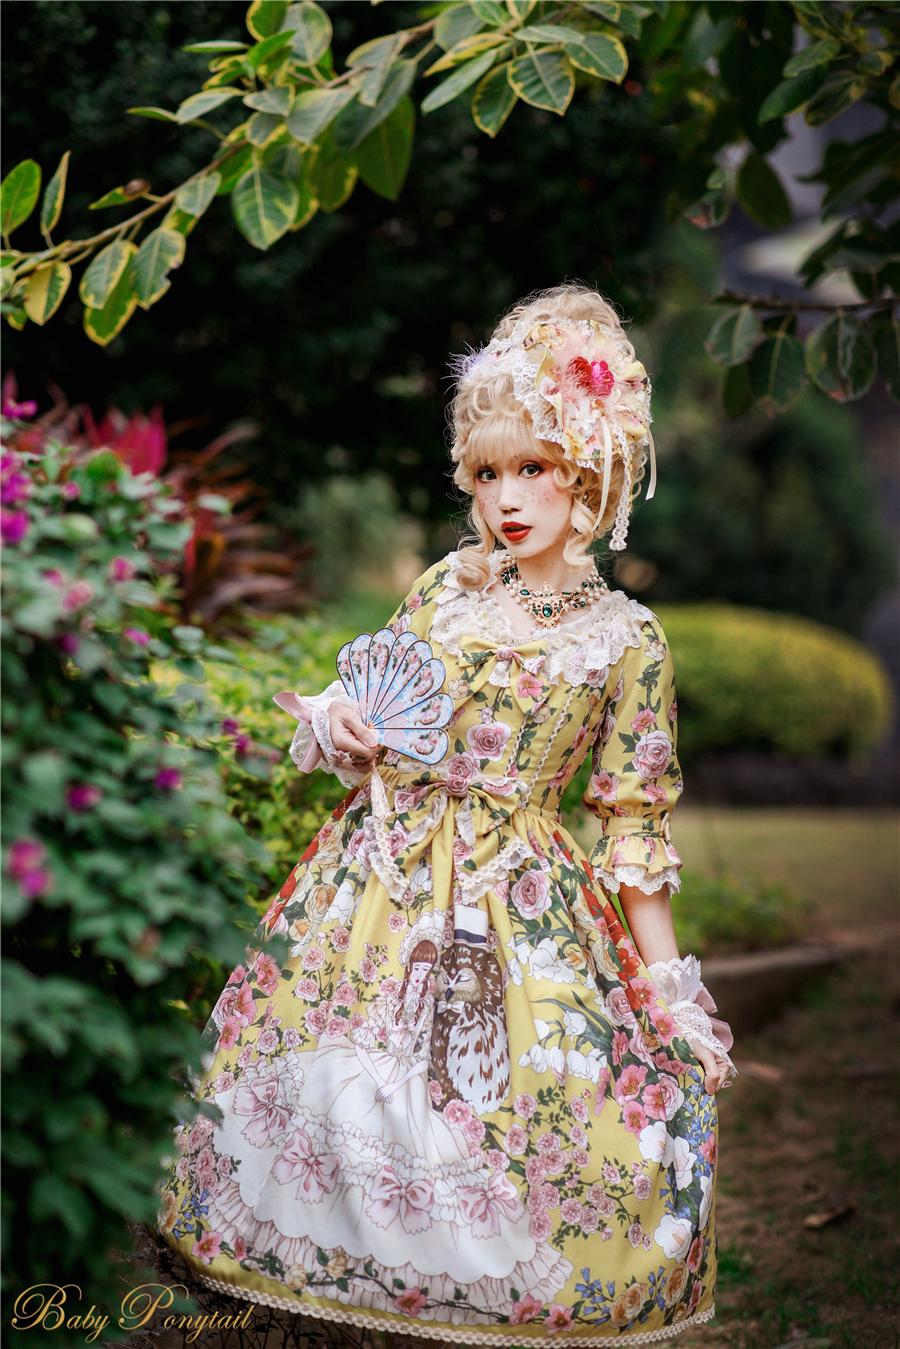 Baby Ponytail_Model Photo_Polly's Garden of Dreams_OP Yellow_Kaka_04.jpg